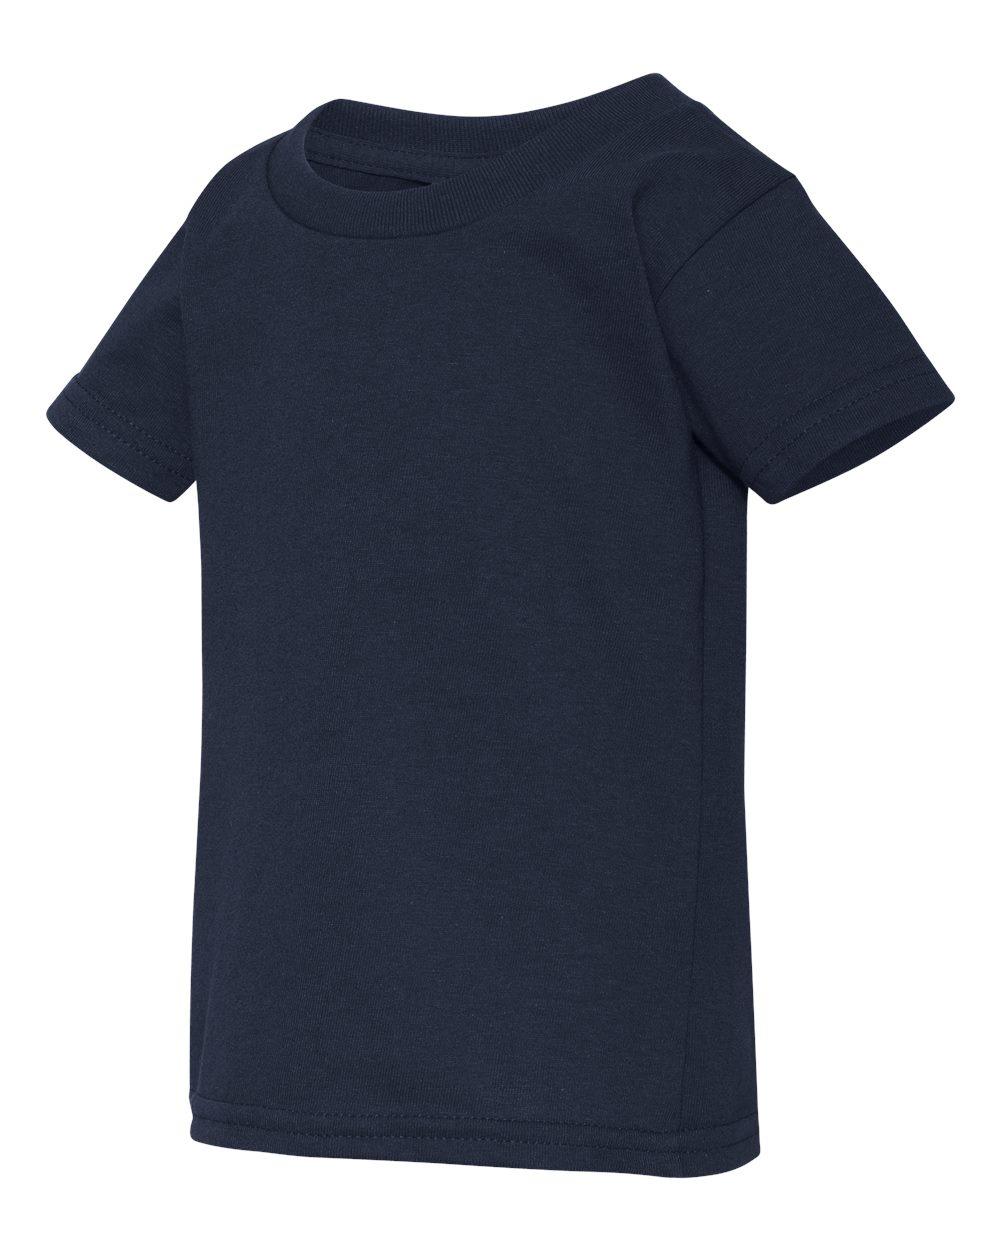 Gildan 5100p heavy cotton toddler t shirt friendly for Toddler t shirt printing